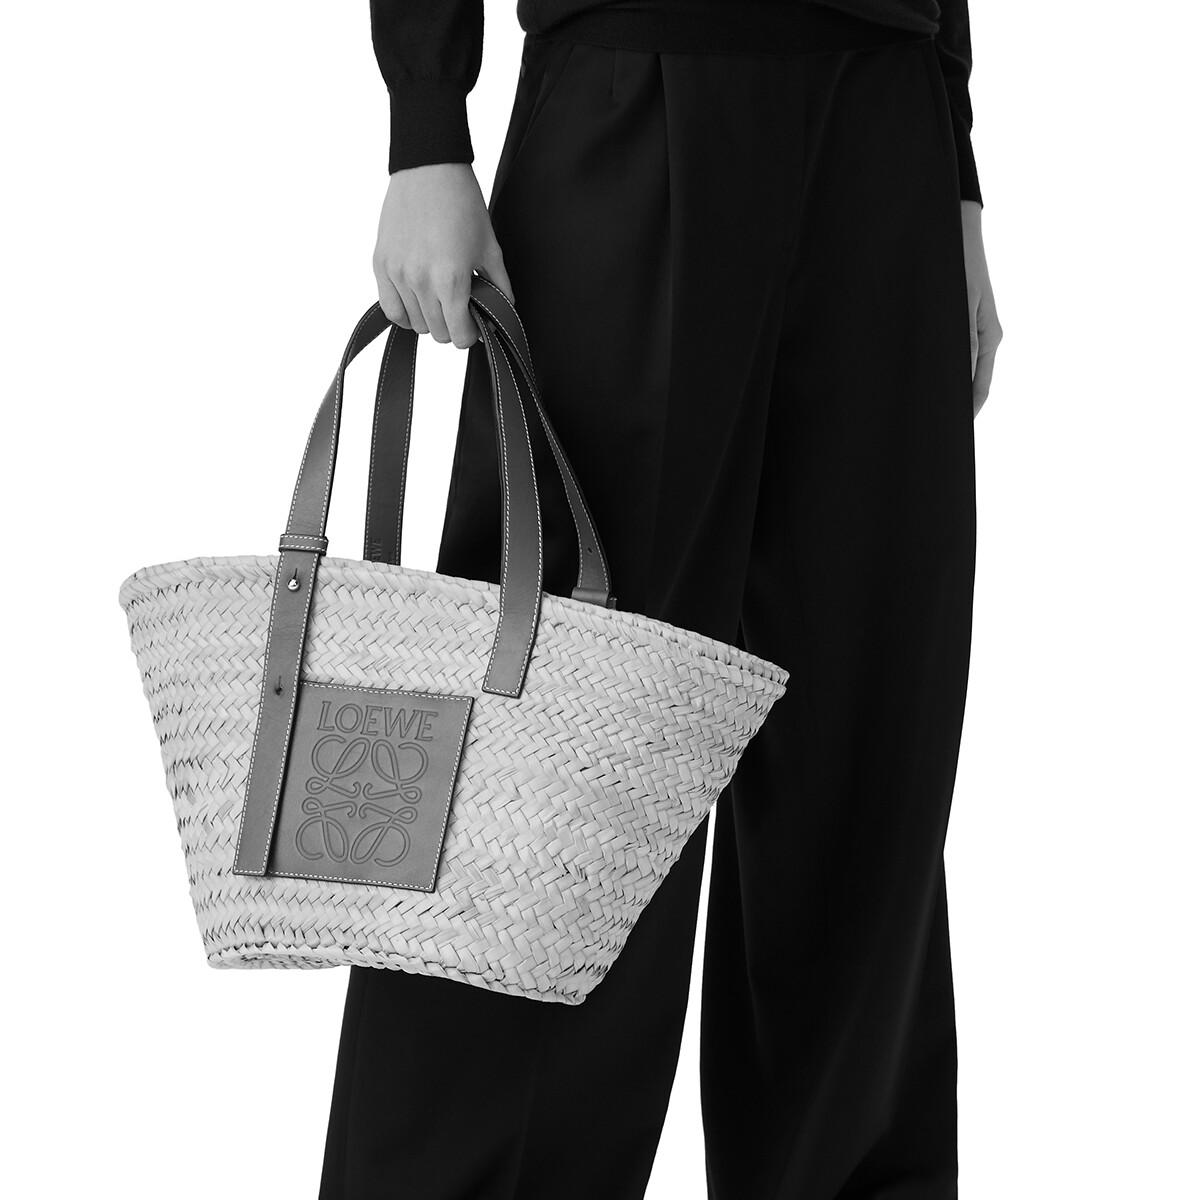 LOEWE Basket Bag 原色/棕褐色 front